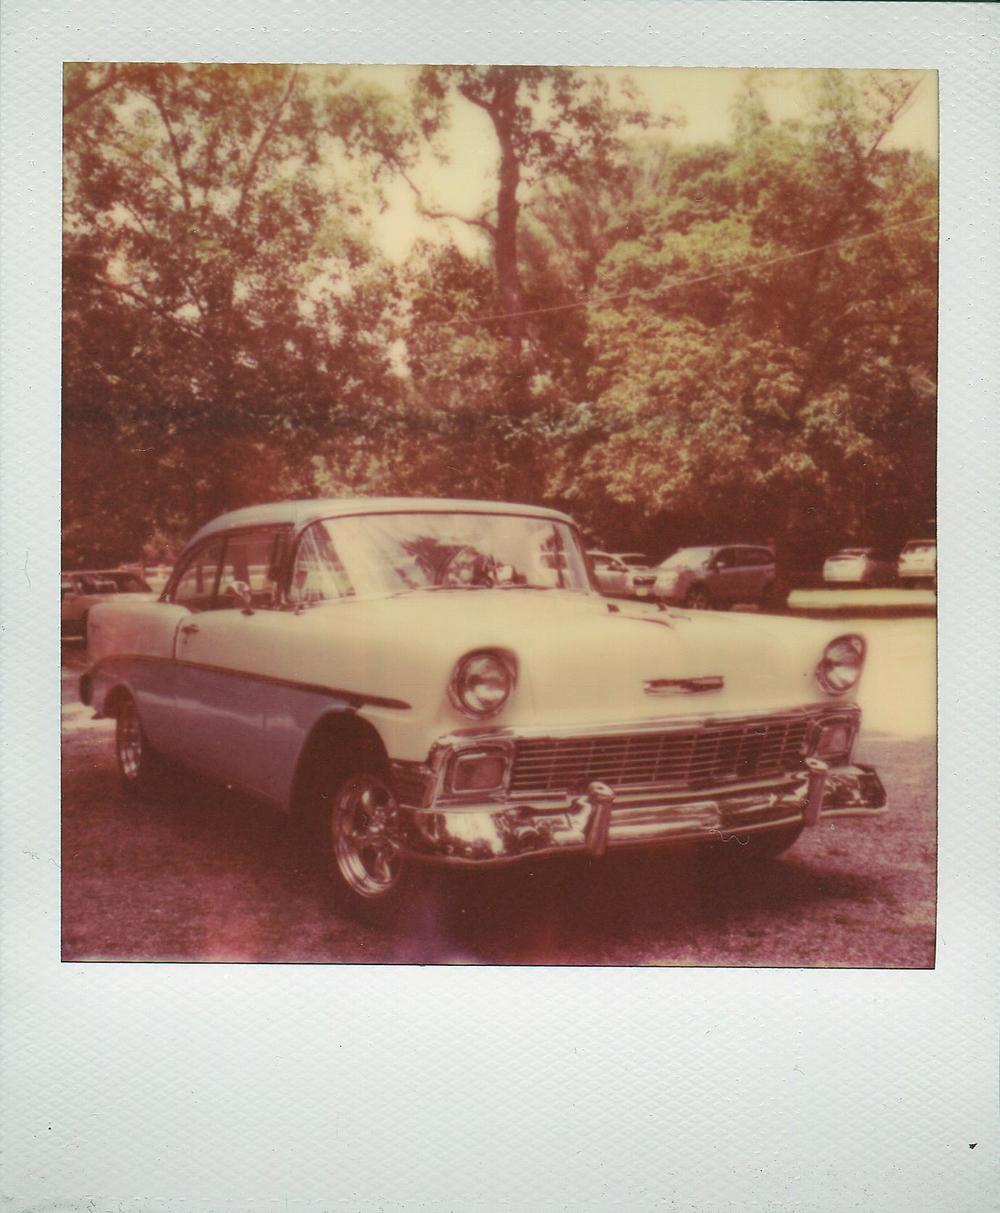 PA classic car 062014.jpg